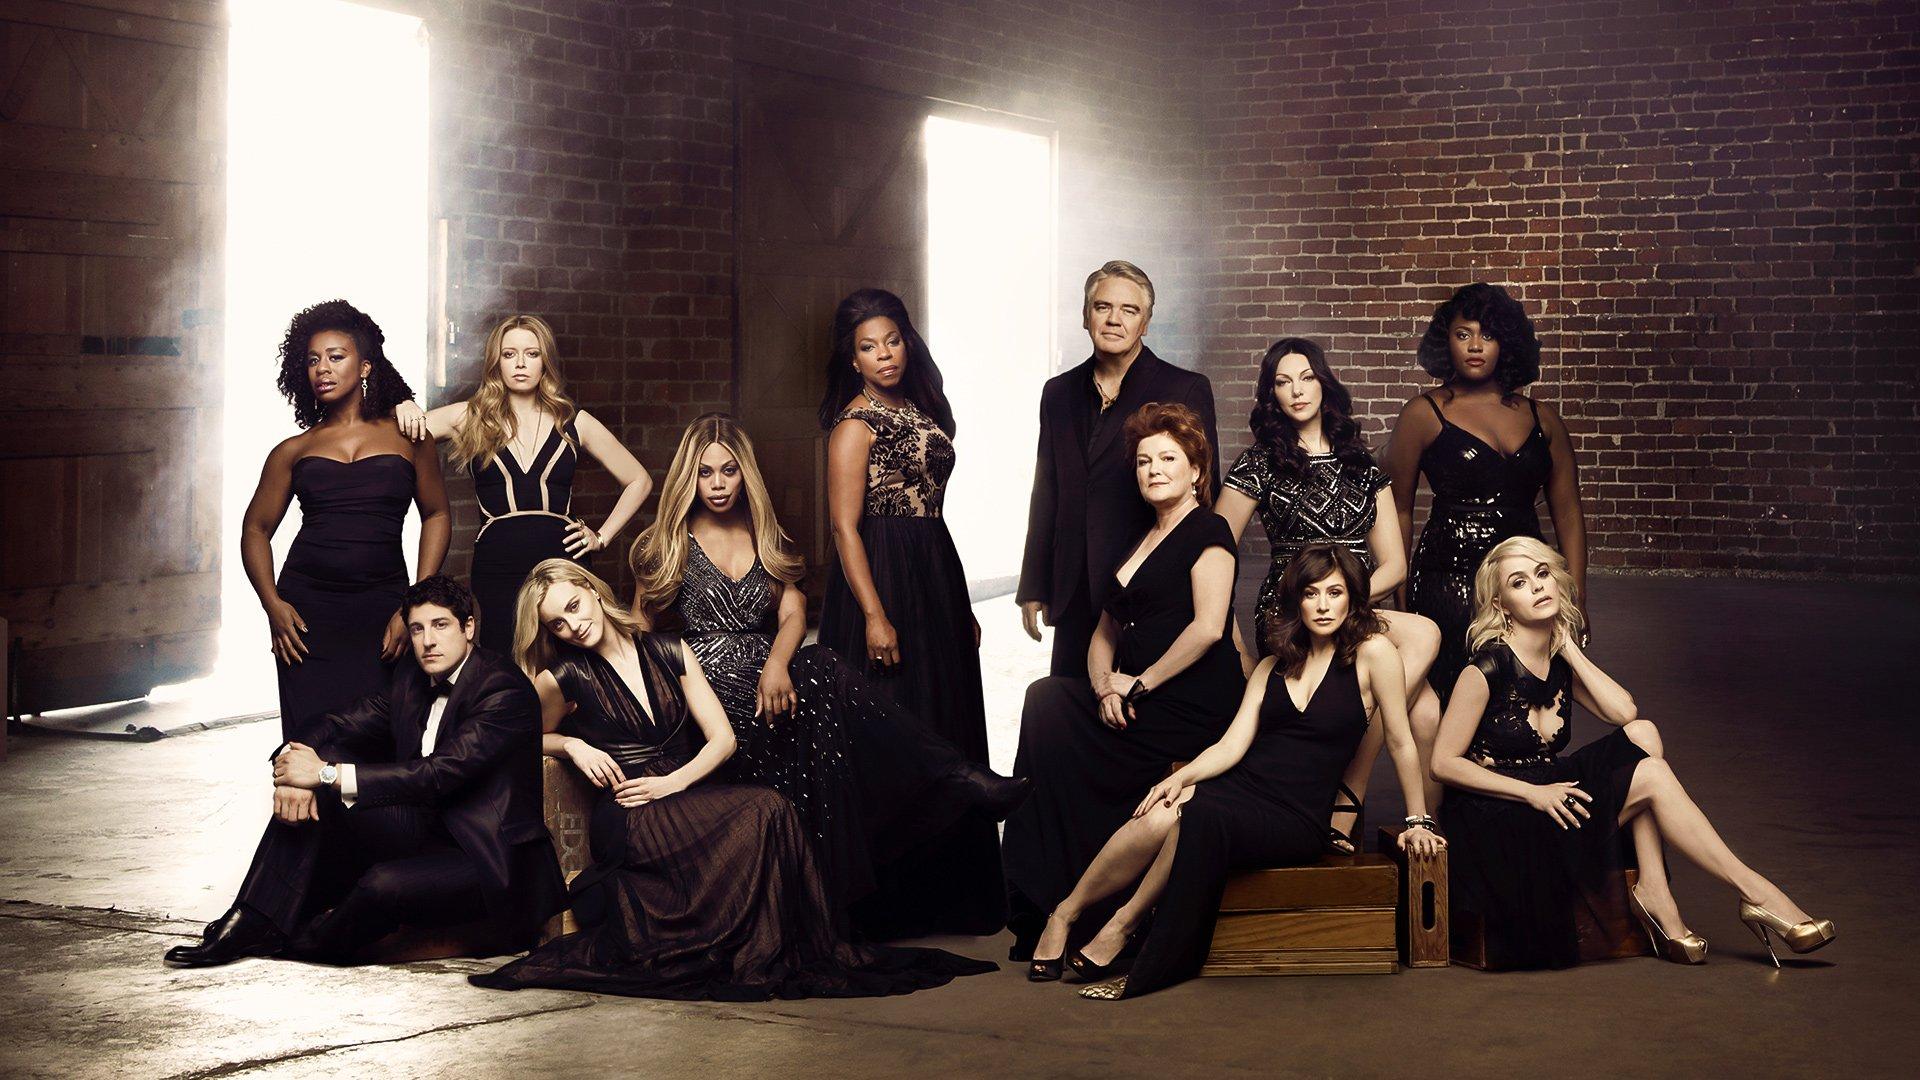 Orange Is The New Black Cast Photo Shoot Hd Wallpaper Background